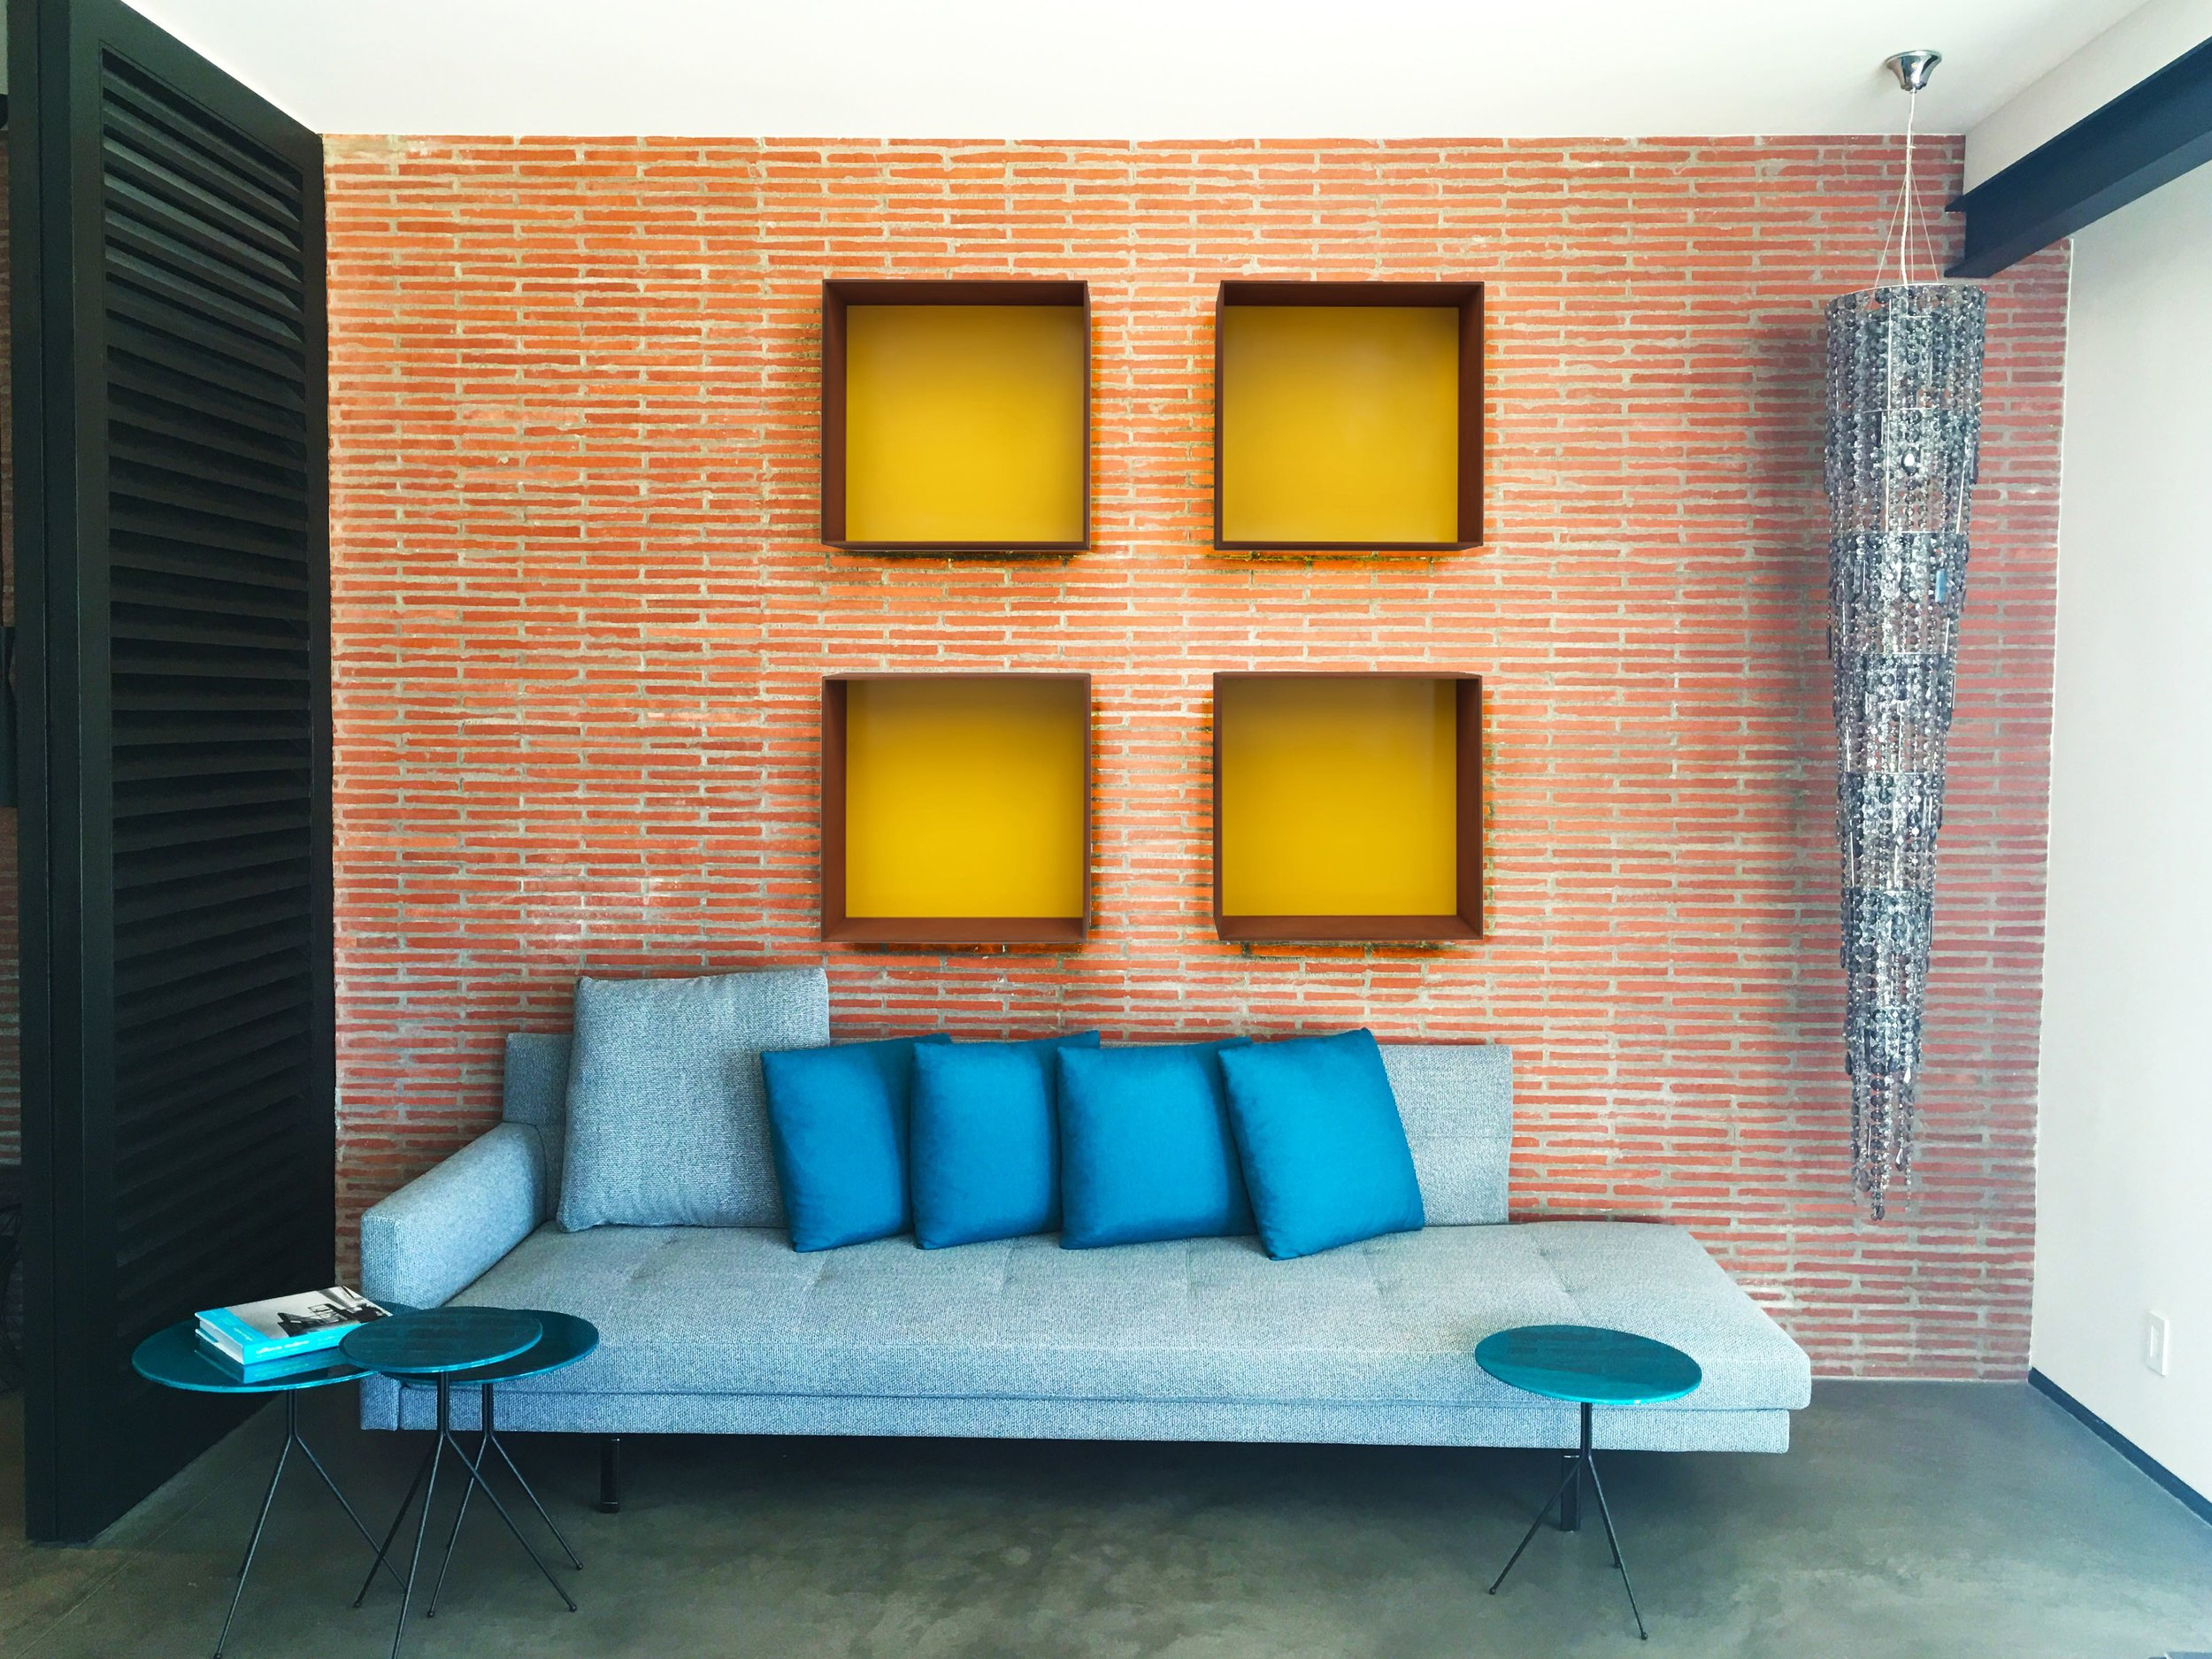 01-lounge2.jpg